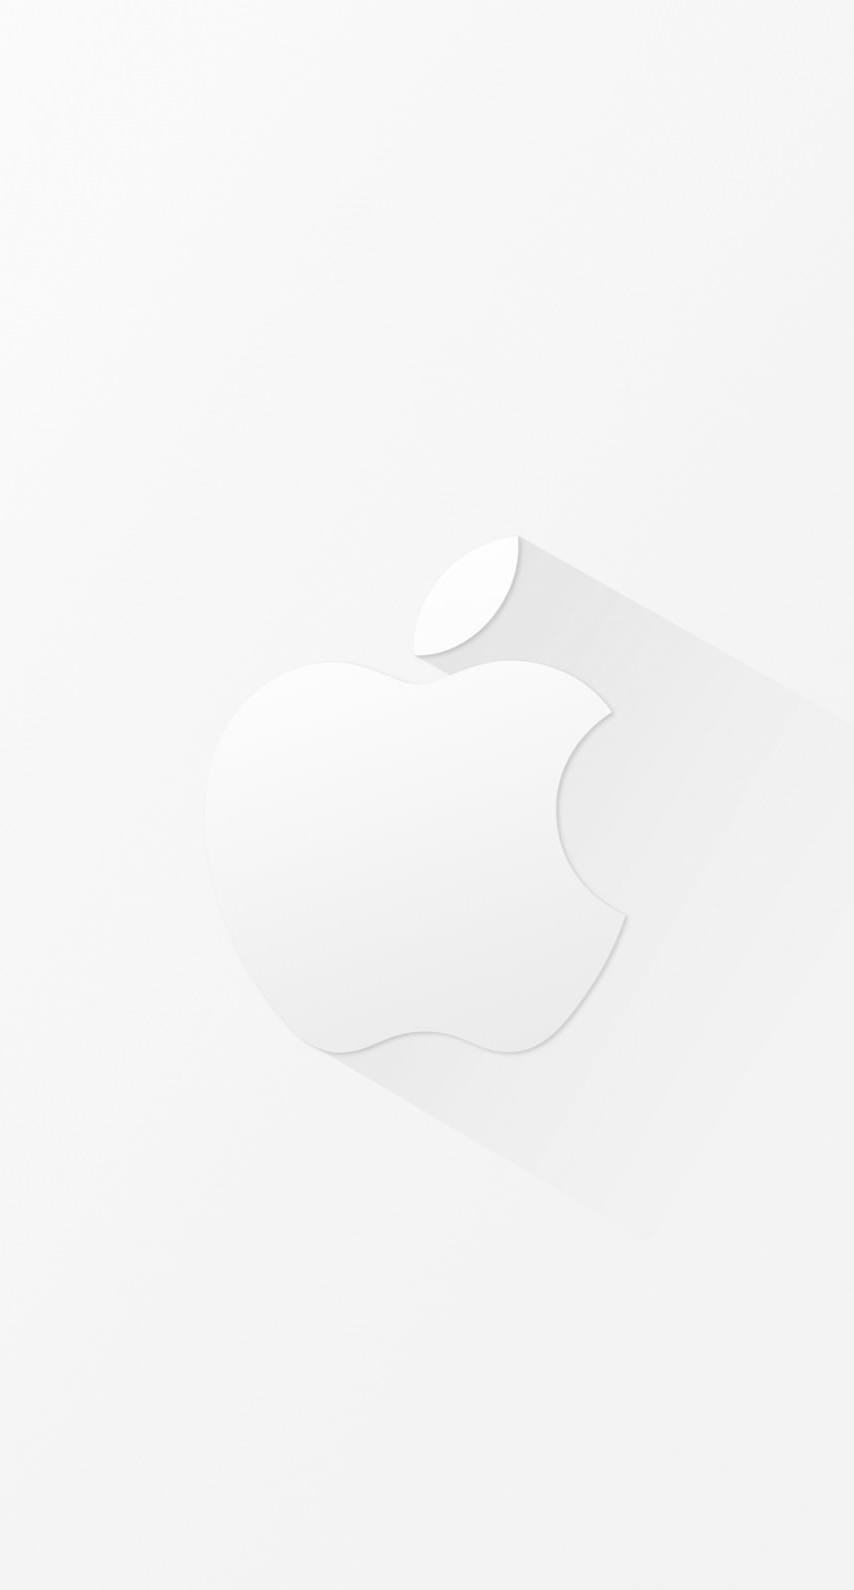 Cool White Apple Logo Wallpaper Sc Iphone8